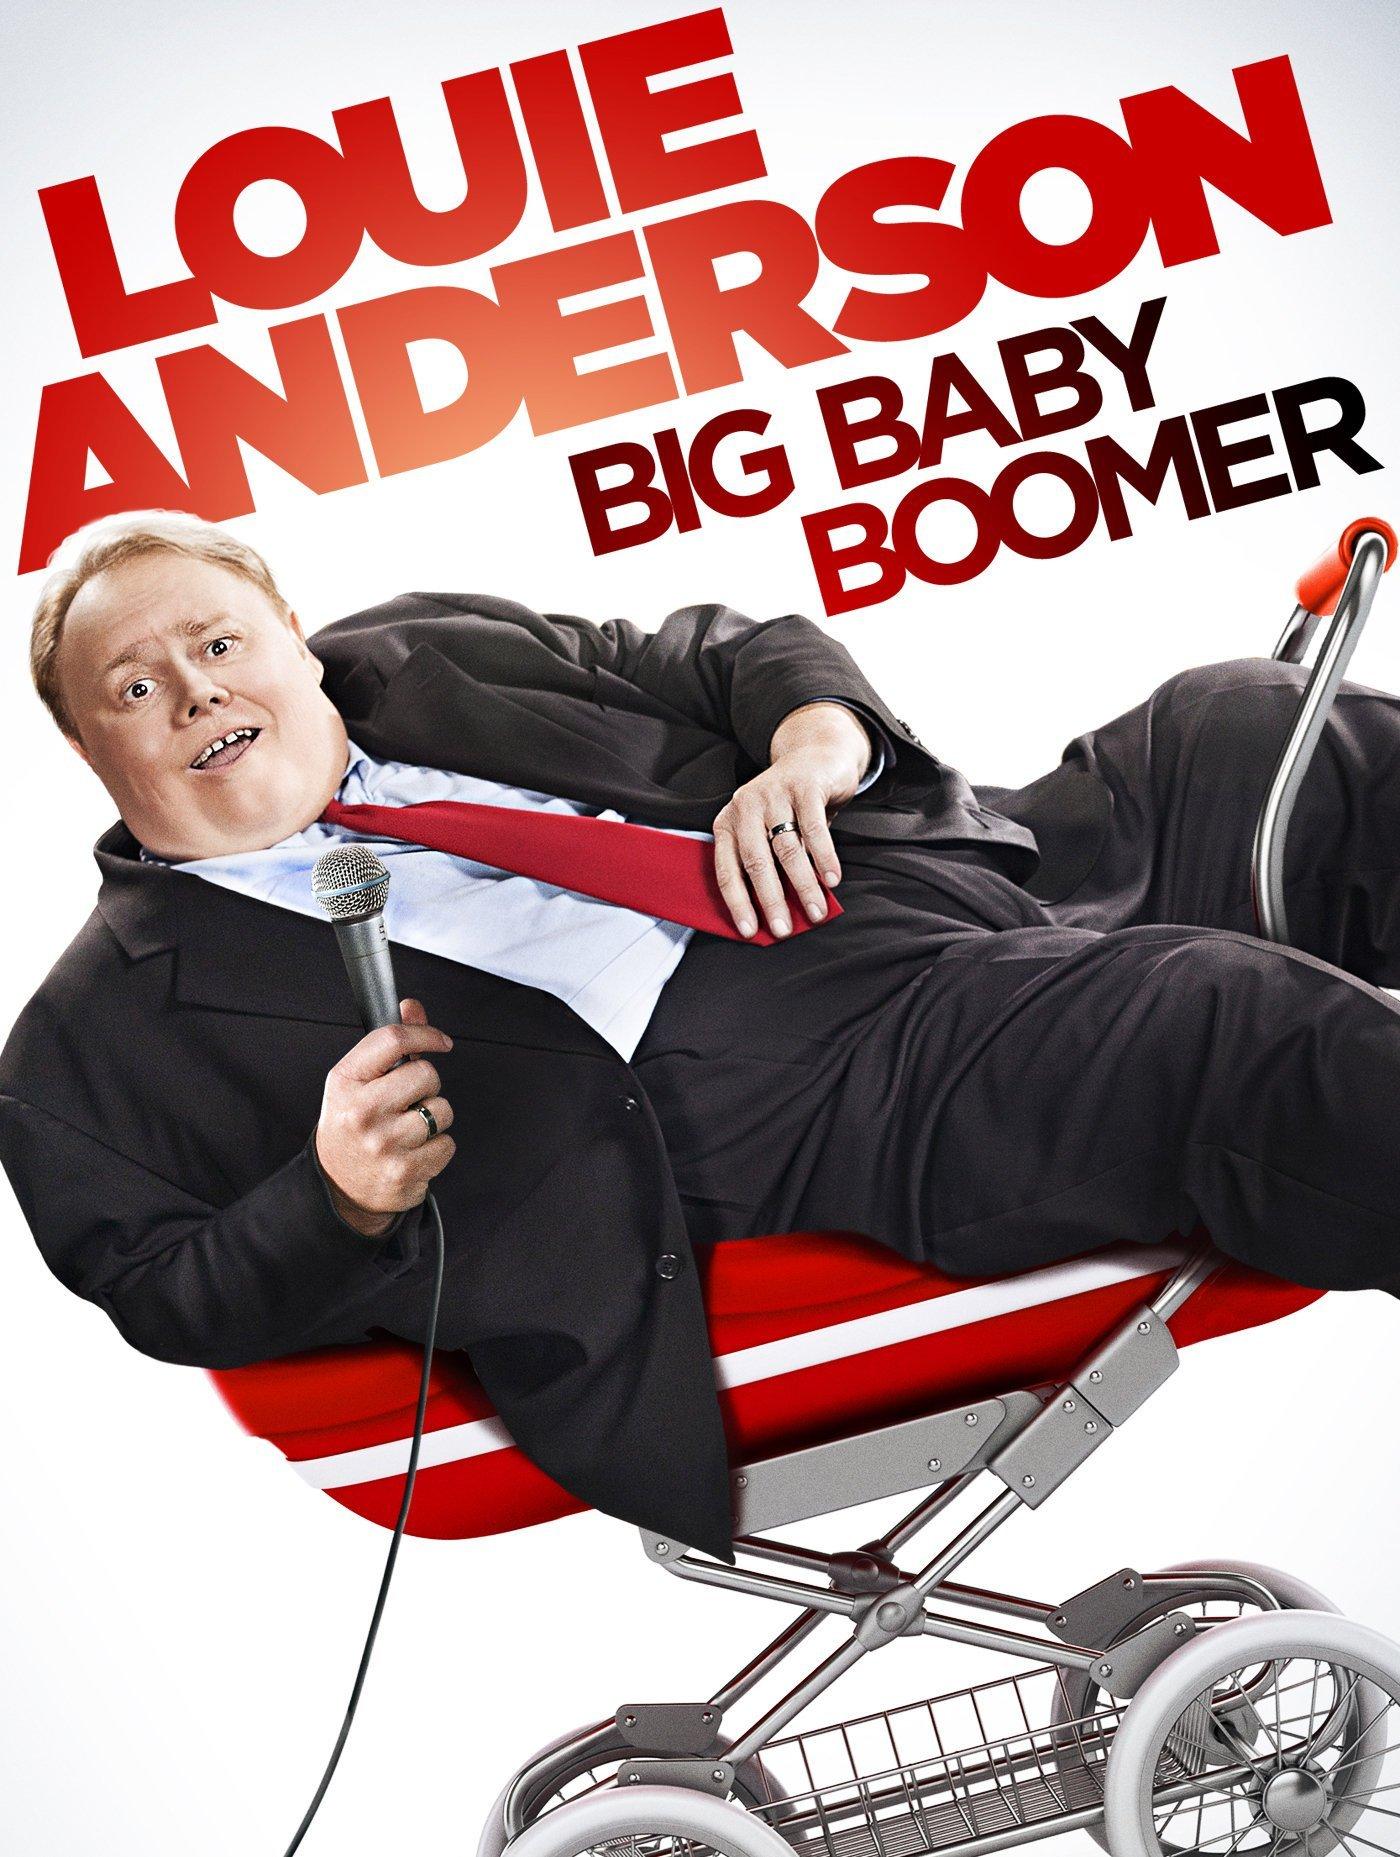 Amazon Com Watch Louie Anderson Big Baby Boomer Prime Video